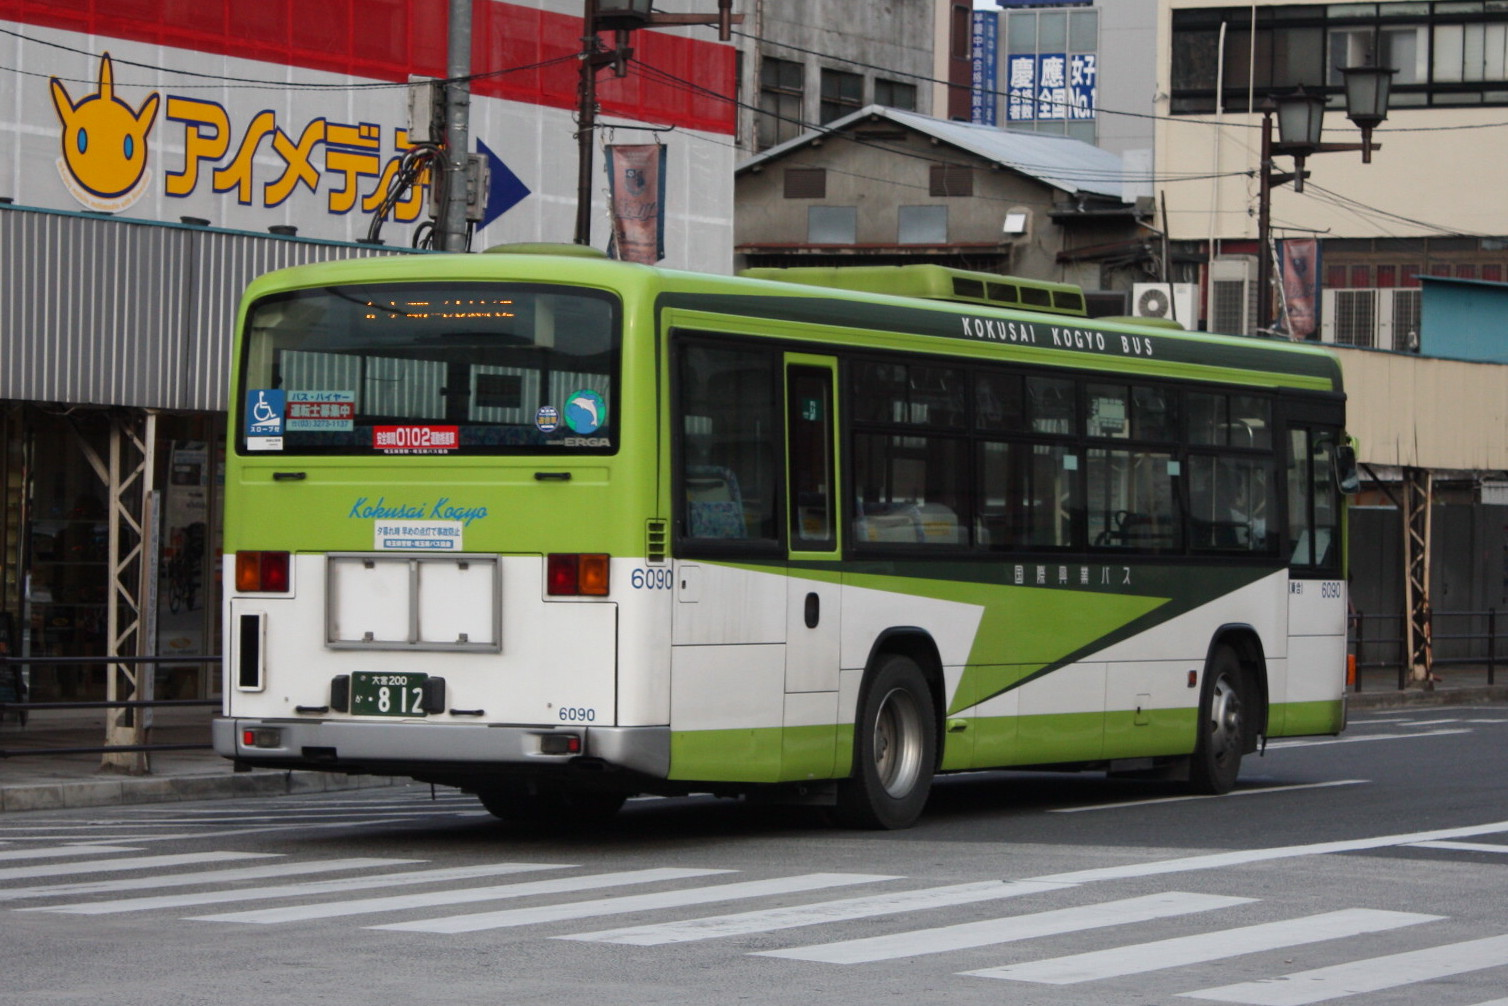 Kokusai_kogyo_bus_6090-2.JPG